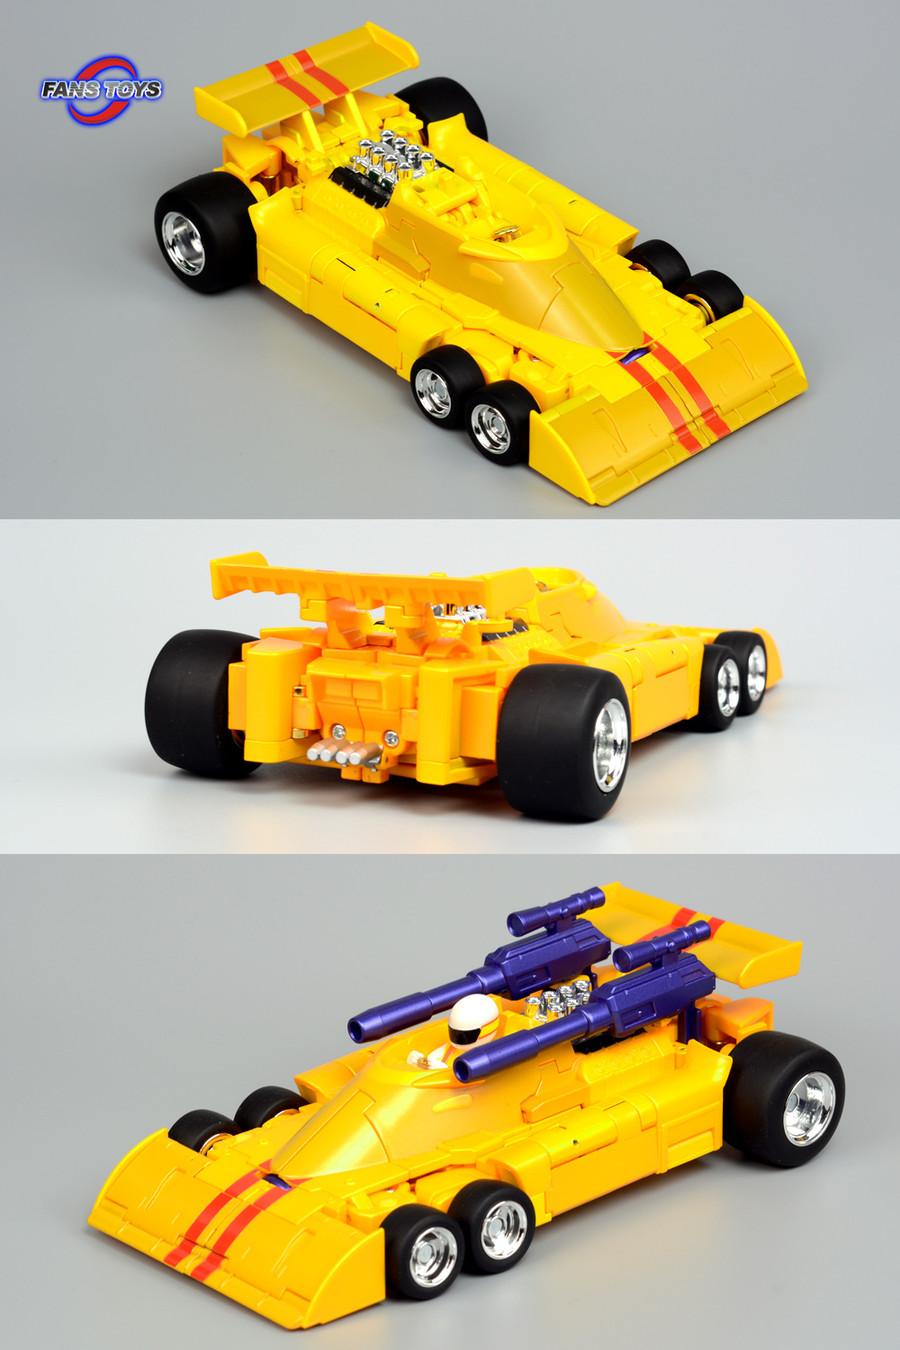 Fans Toys - FT-31D Smokey